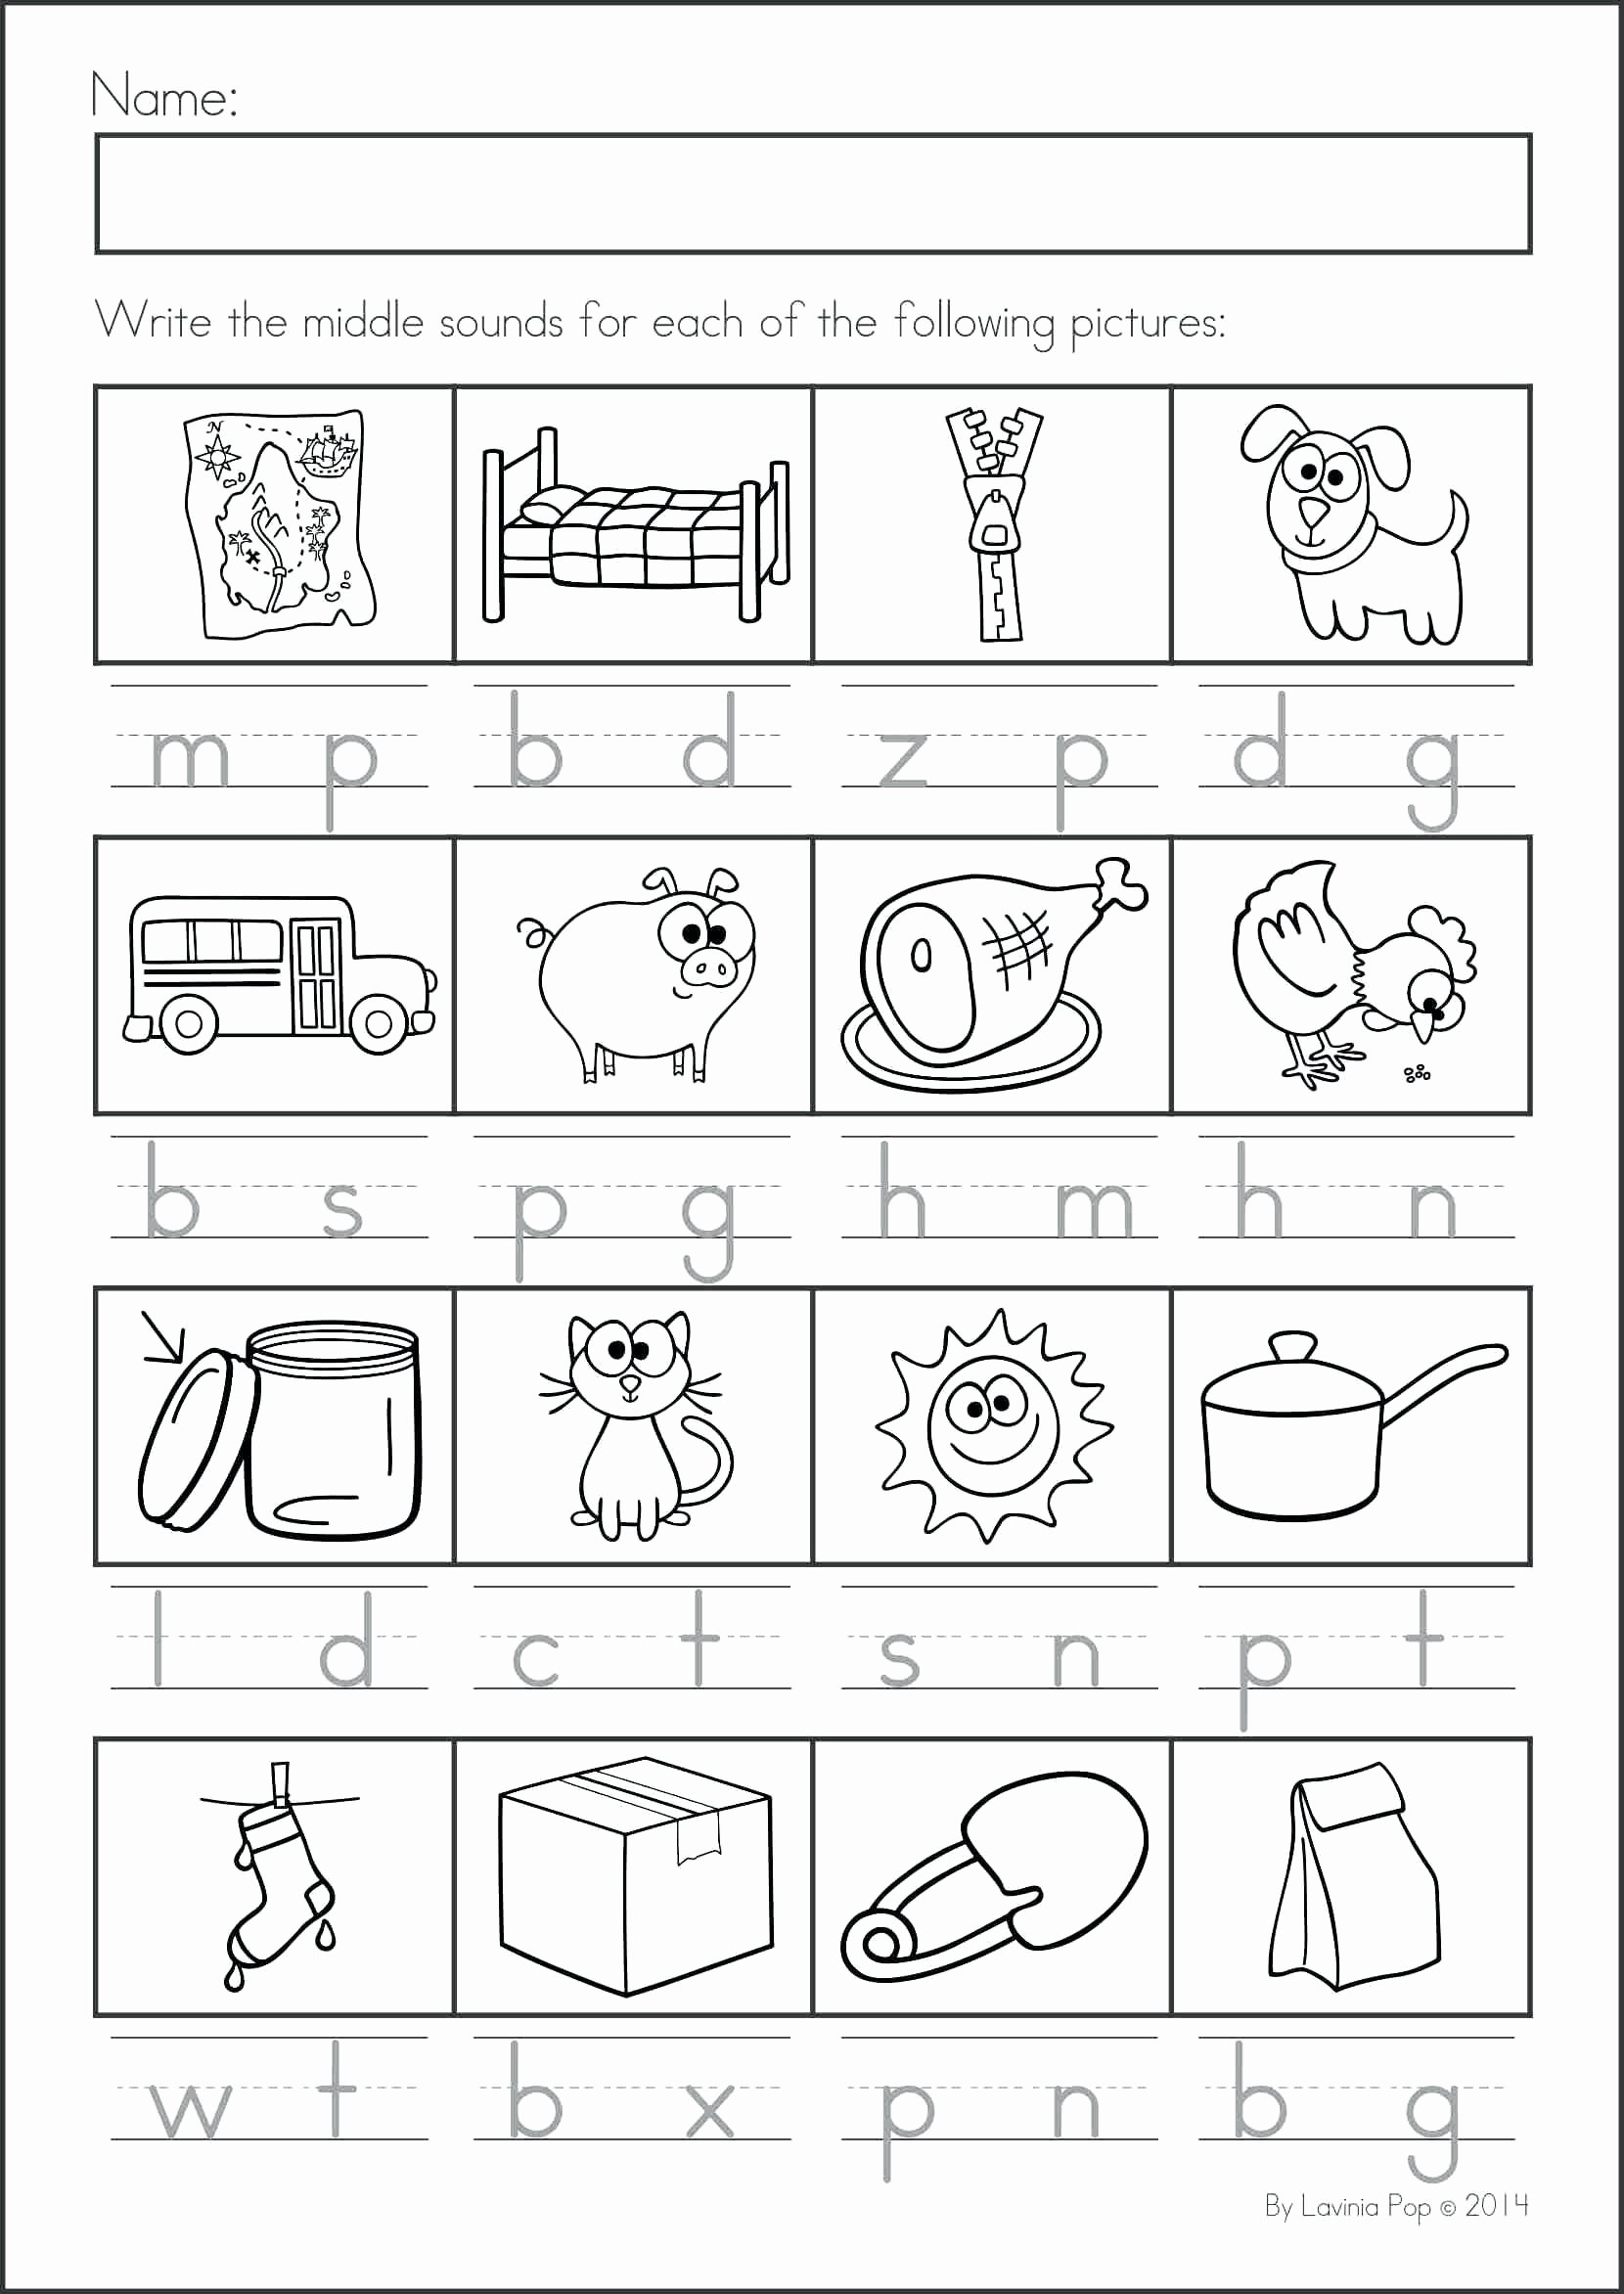 Language Arts Worksheets for Preschoolers Printable Worksheet Kindergarten Reading Language Arts Worksheets